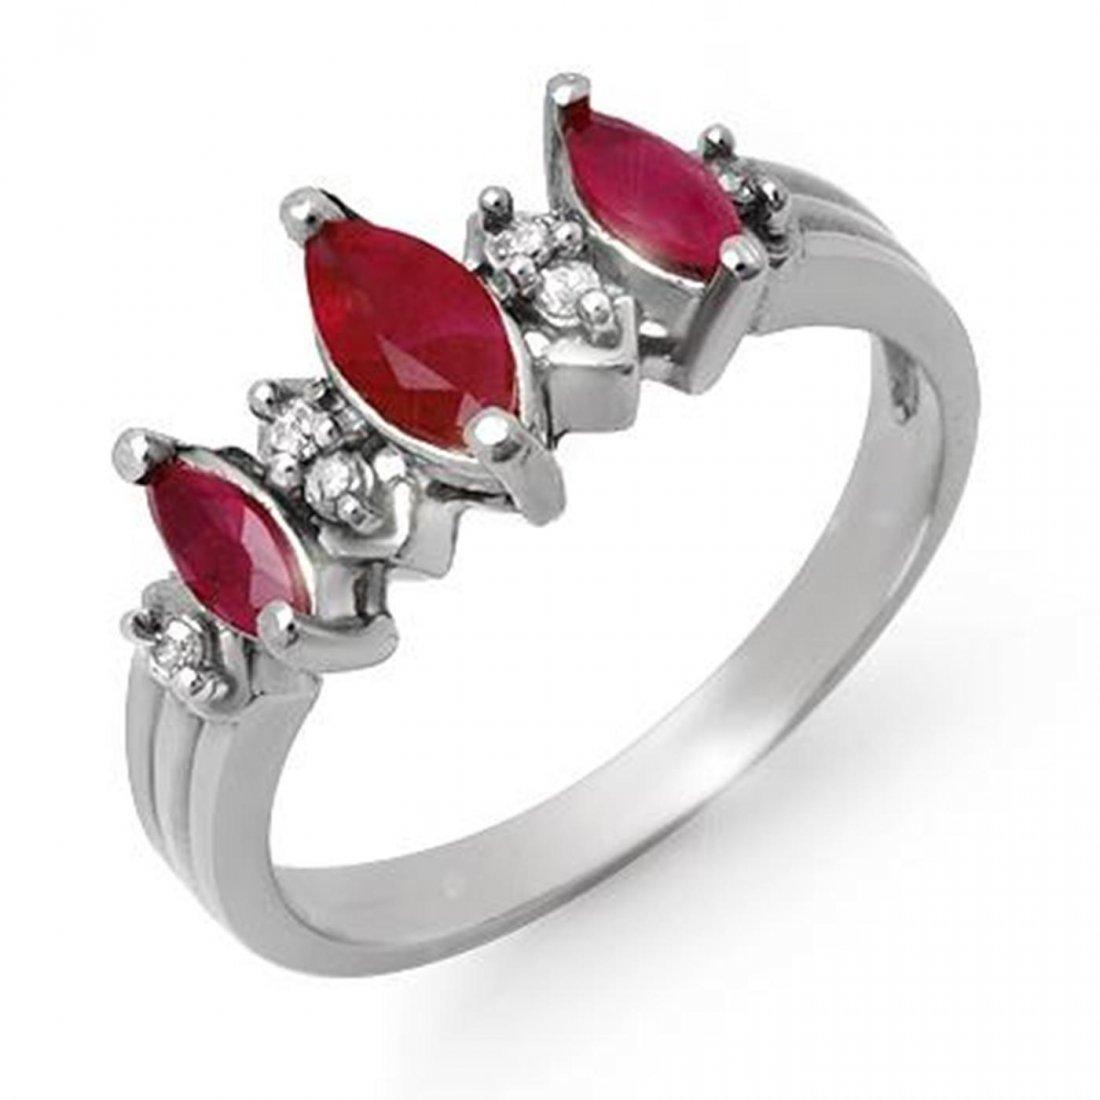 2J: Genuine 1.0 ctw Ruby & Diamond Ring 10K White Gold